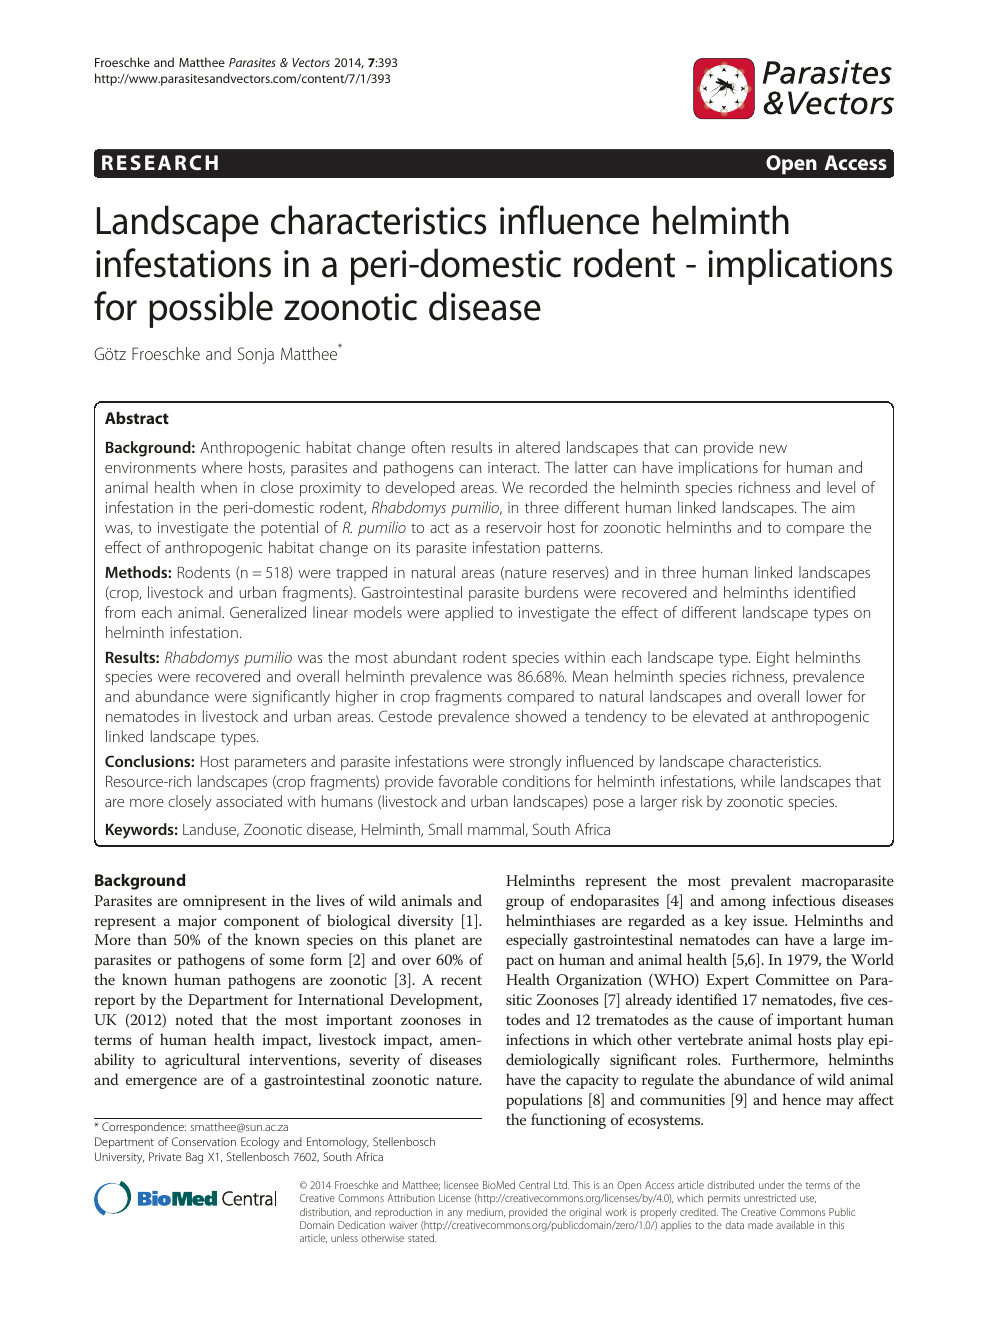 helminth zoonotic diseases helmintox ordonnance